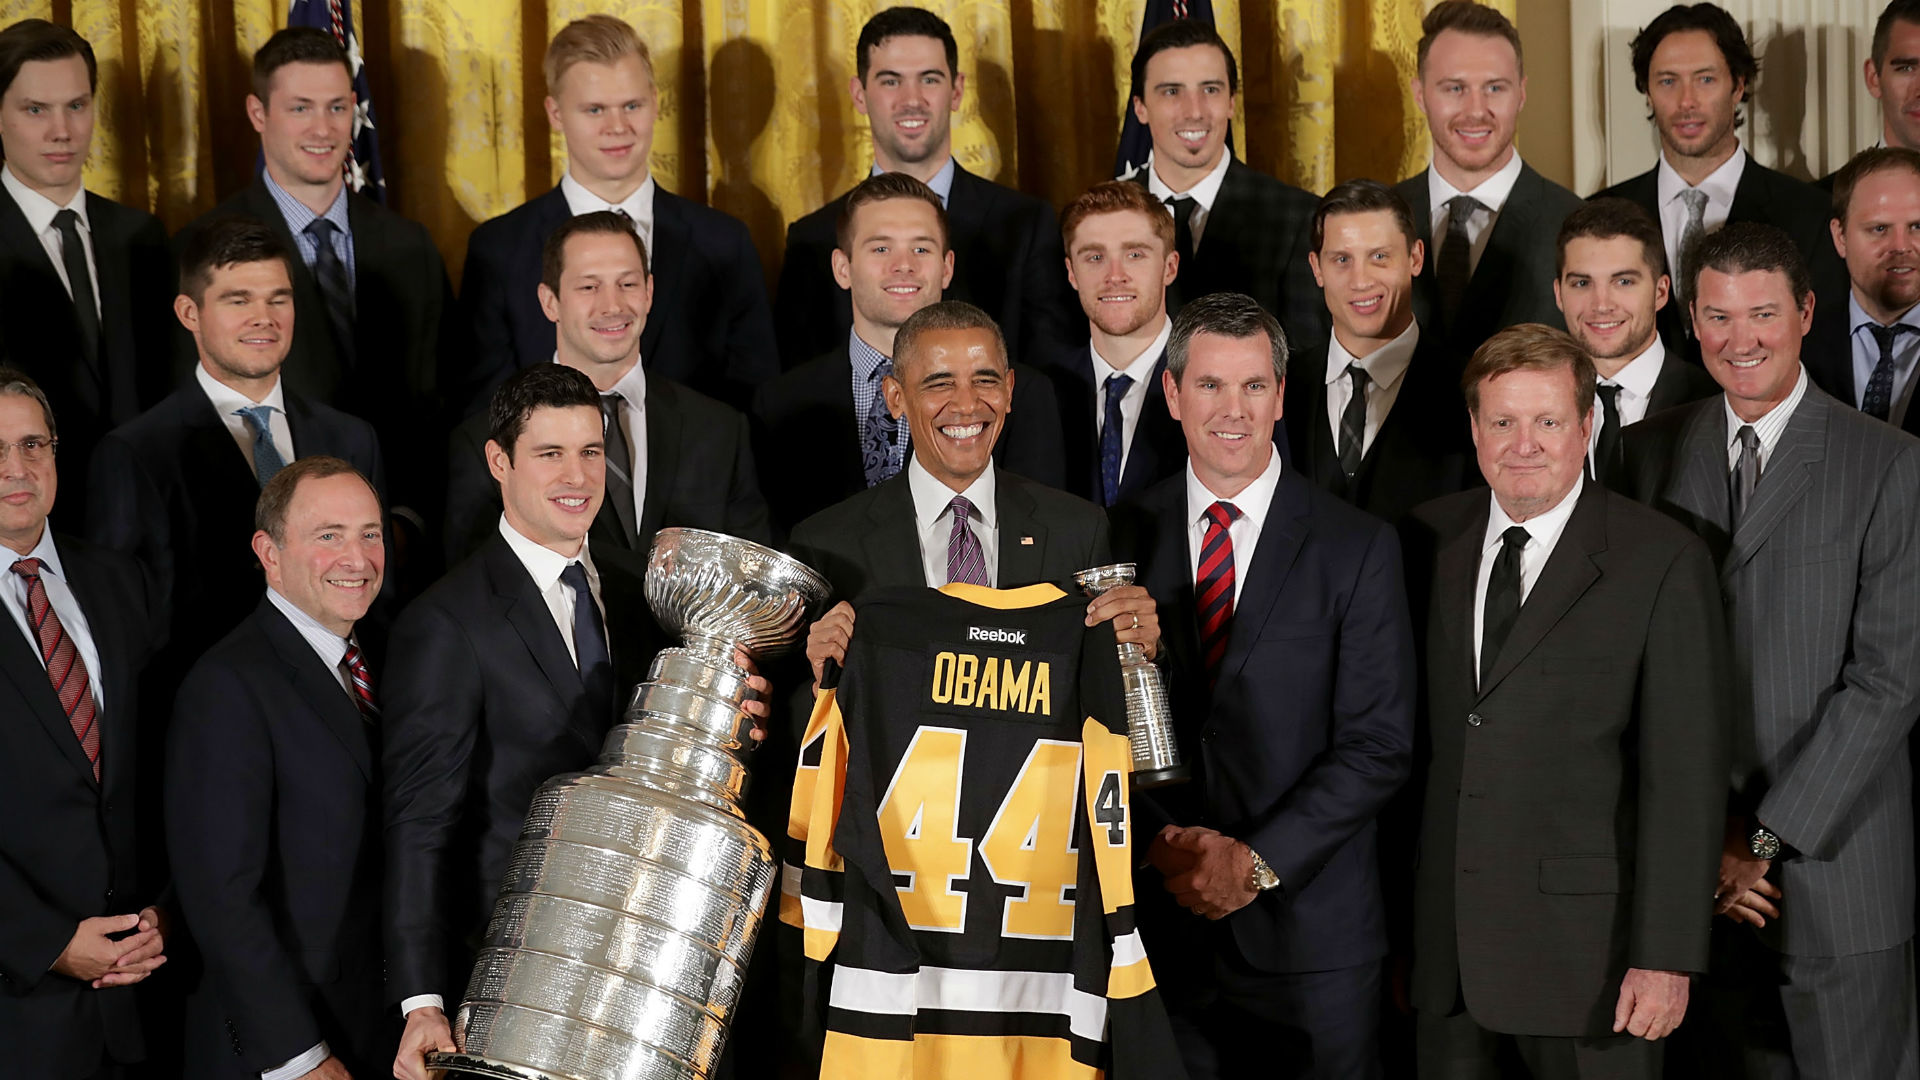 Penguins-with-president-obama_nkdvvea0o9fq1x66acb1mb0j3